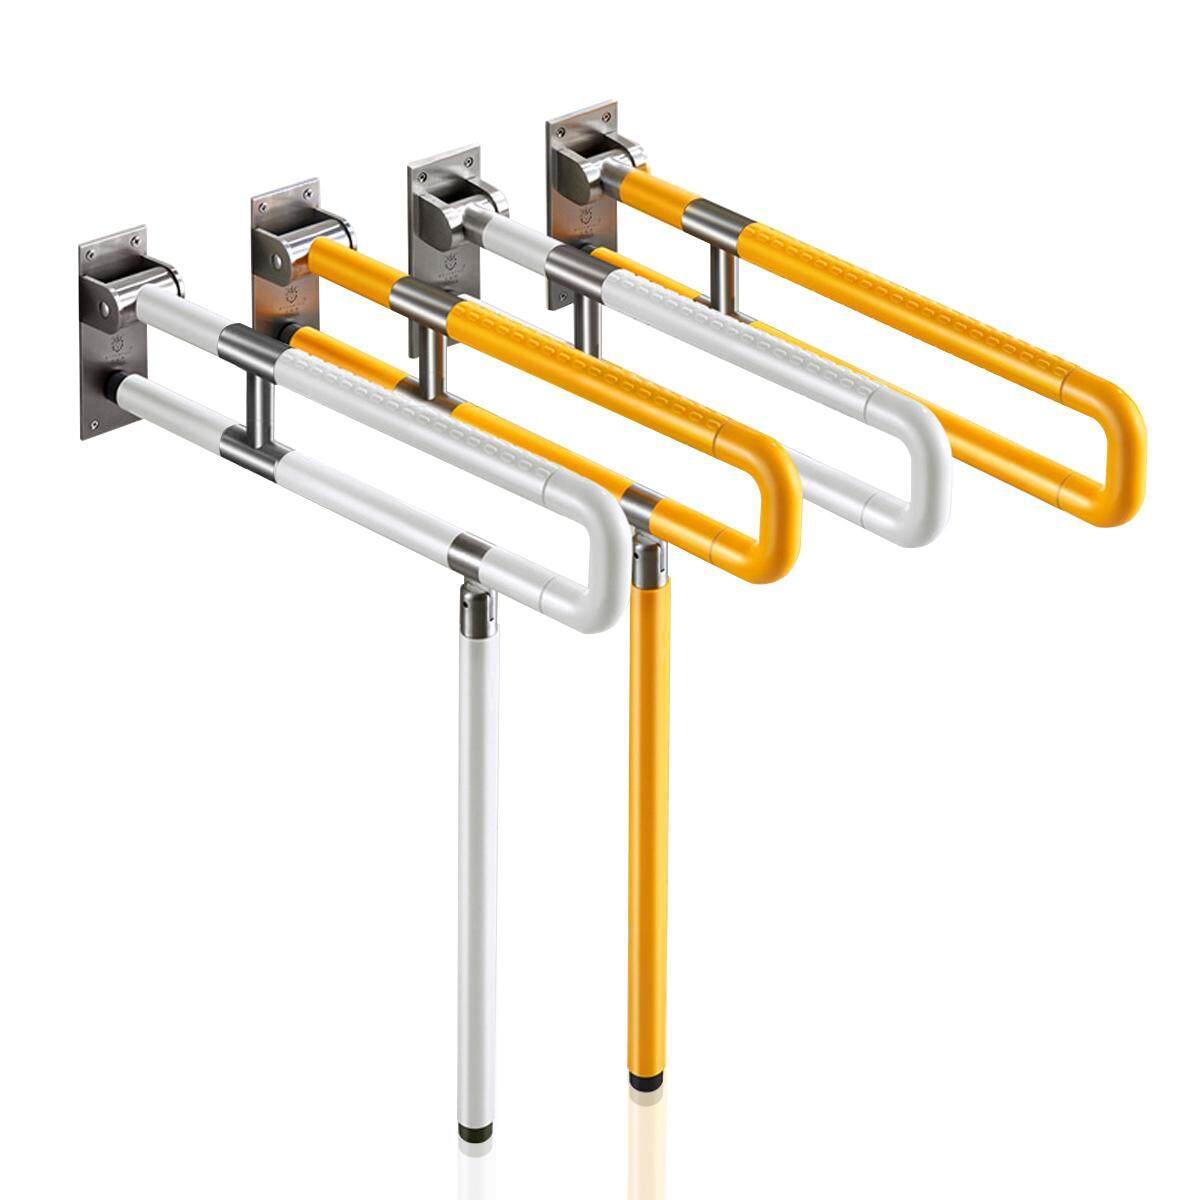 Cheapest Disabled Elderly Toilet Safety Grab Bar Handrail Hospital Bathroom Handrail Intl